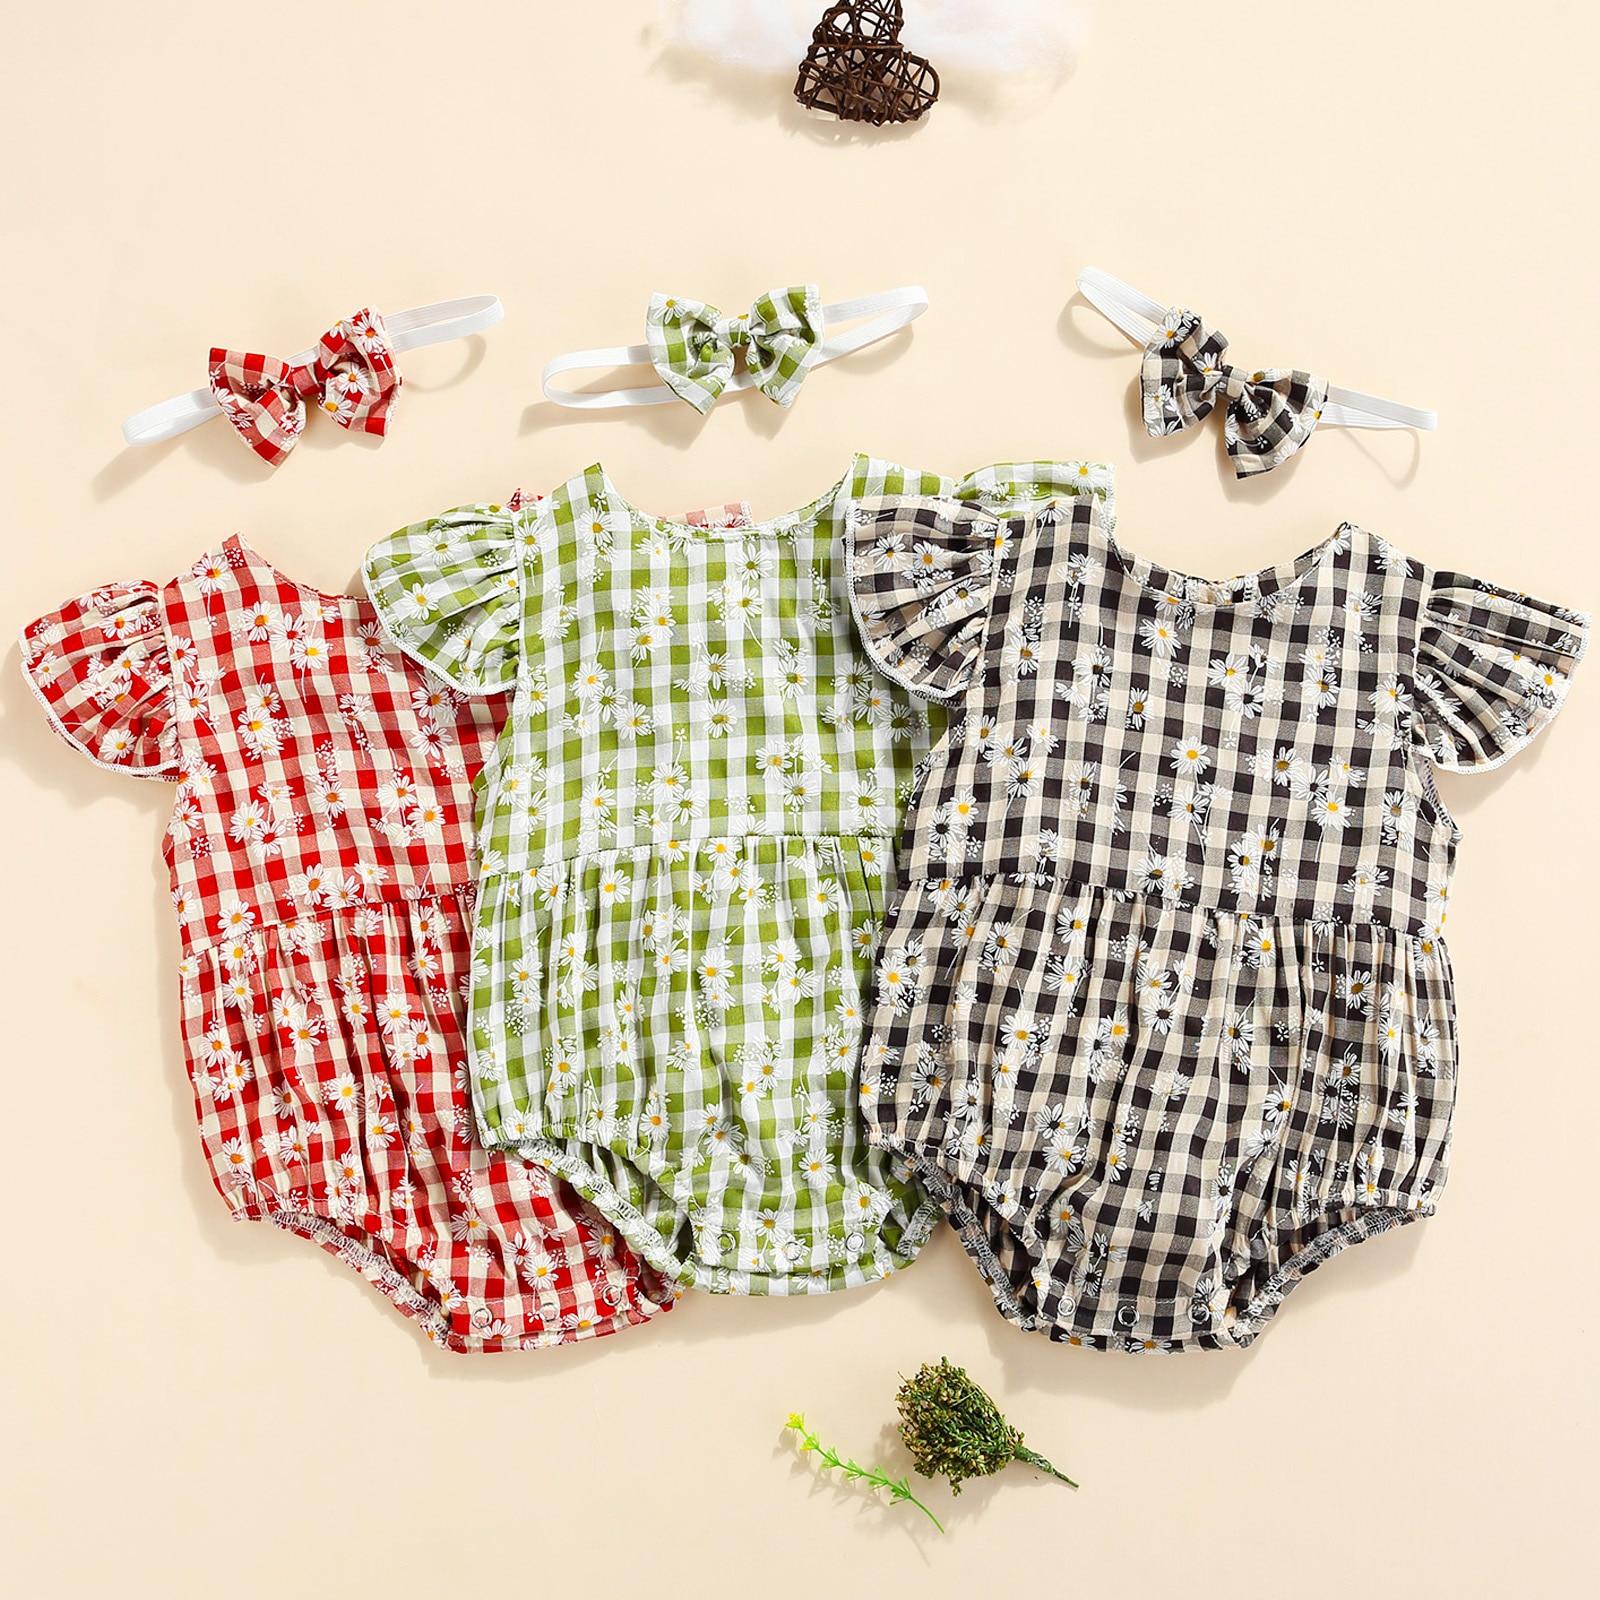 3 Colors Plaid Floral Printed Ruffles Sleeve Jumpsuits Headband 0-24M Summer Baby Girls Boys Sweet Rompers